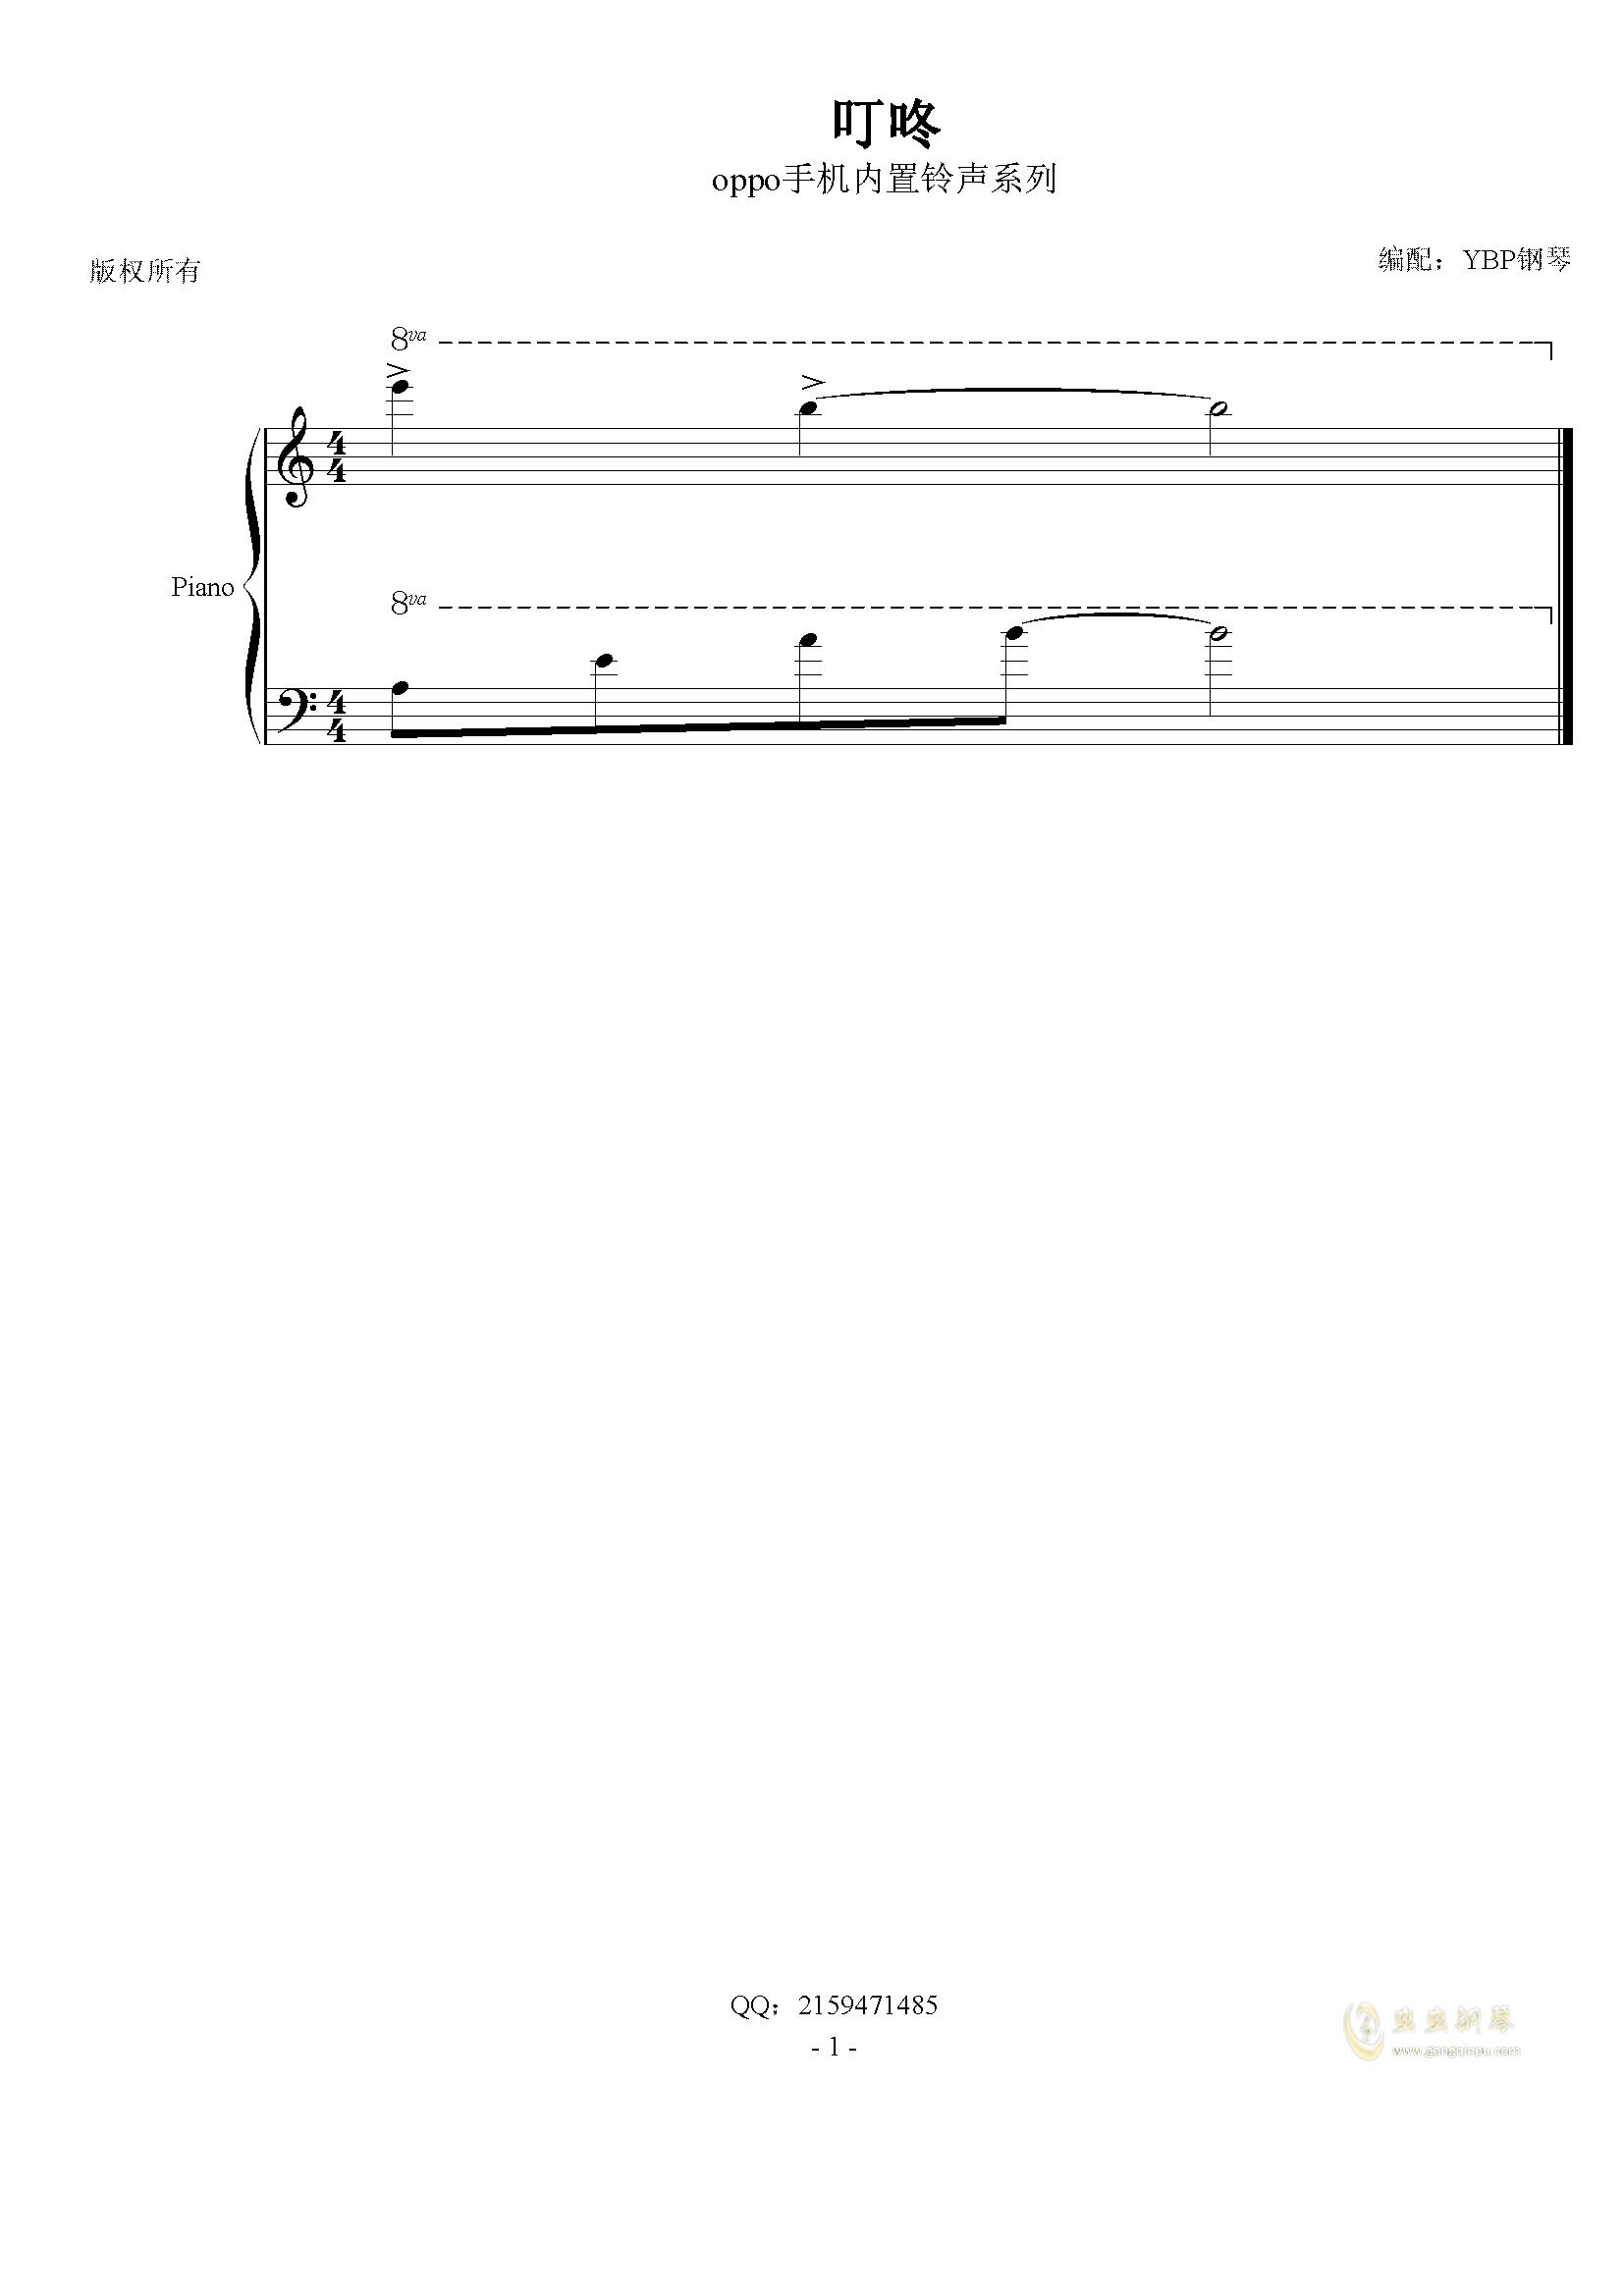 oppo系统内置铃声-叮咚钢琴谱 第1页